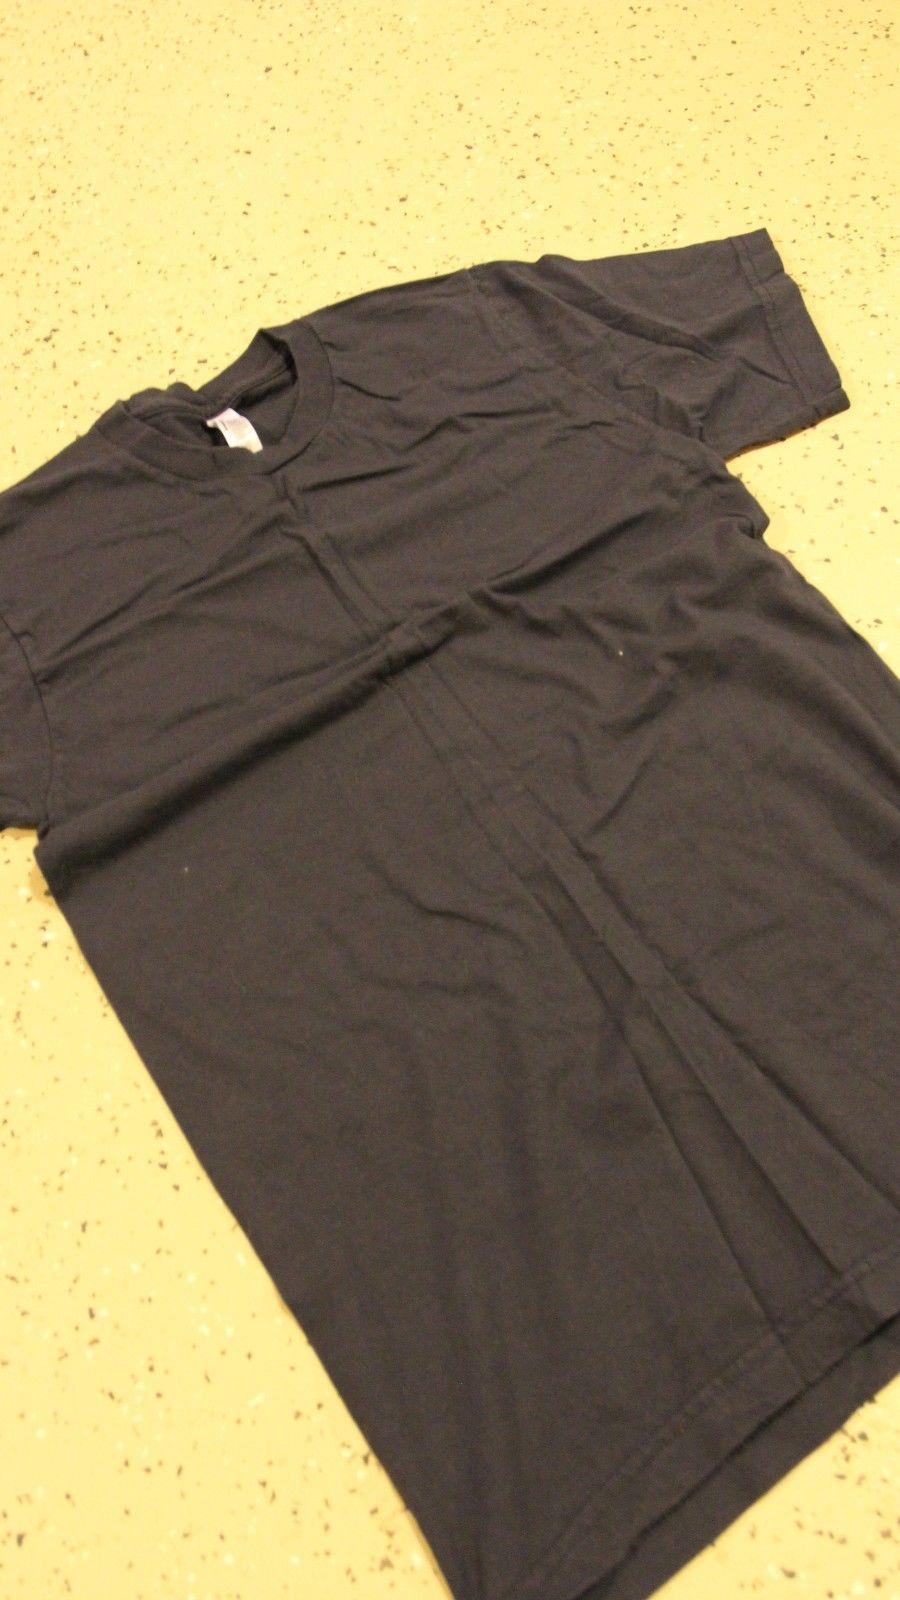 american apparel navy t-shirt